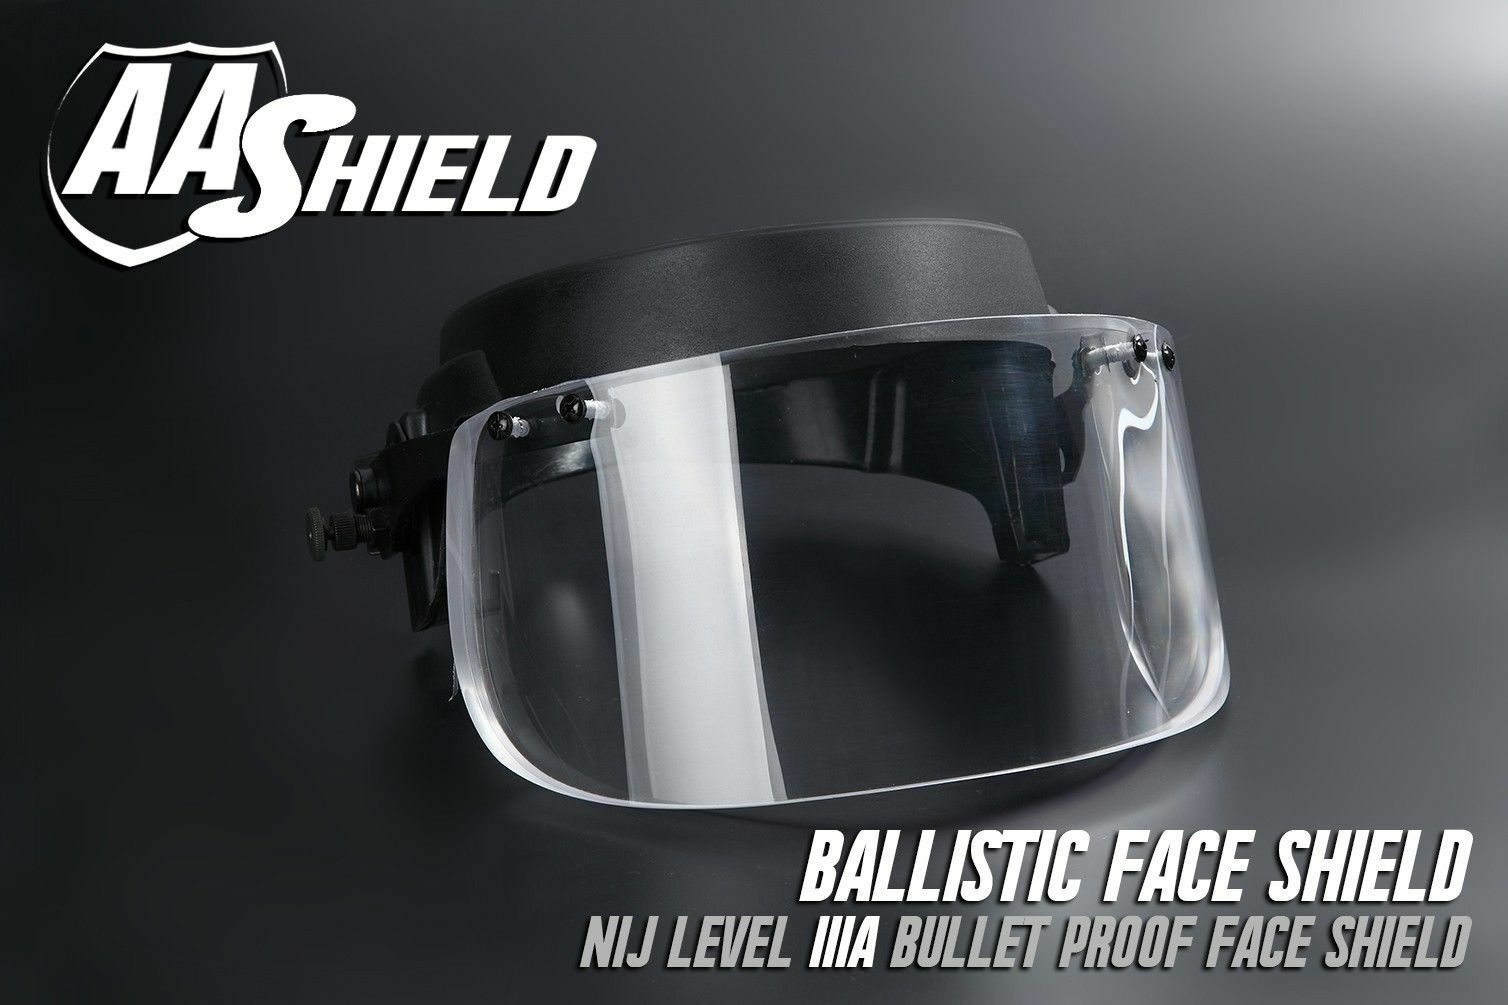 AA SHIELD Bullet  proof Ballistic Visor Face Shield Mask For Helmet Lvl IIIA 3A  incentive promotionals